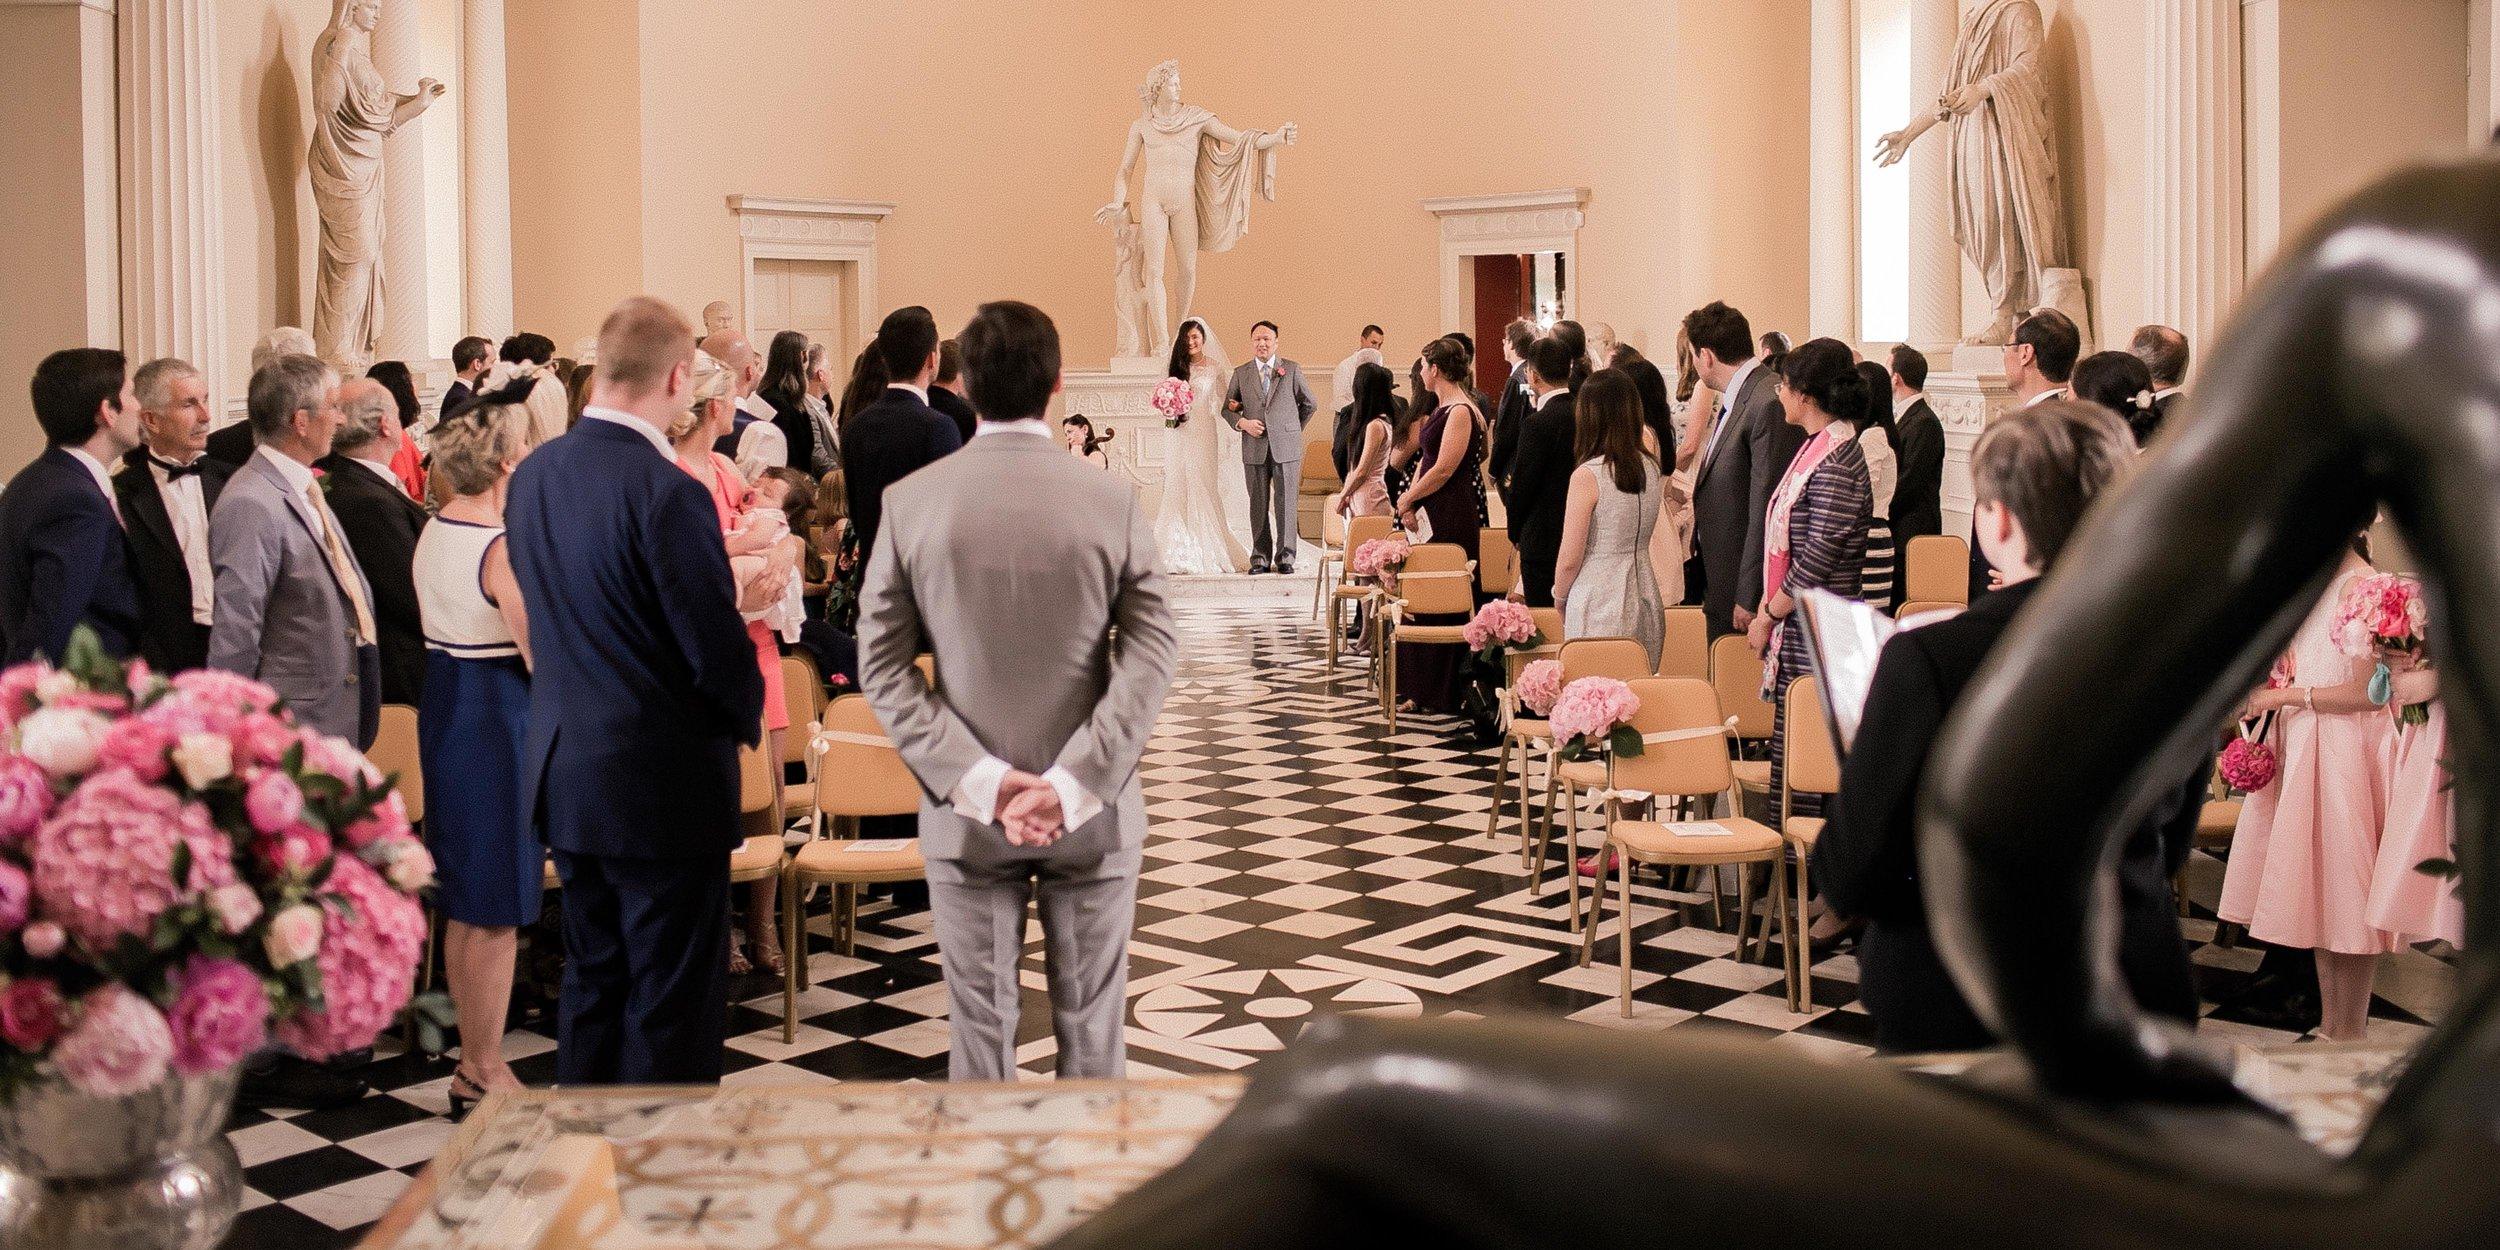 wedding_photographer_surrey_24.jpg